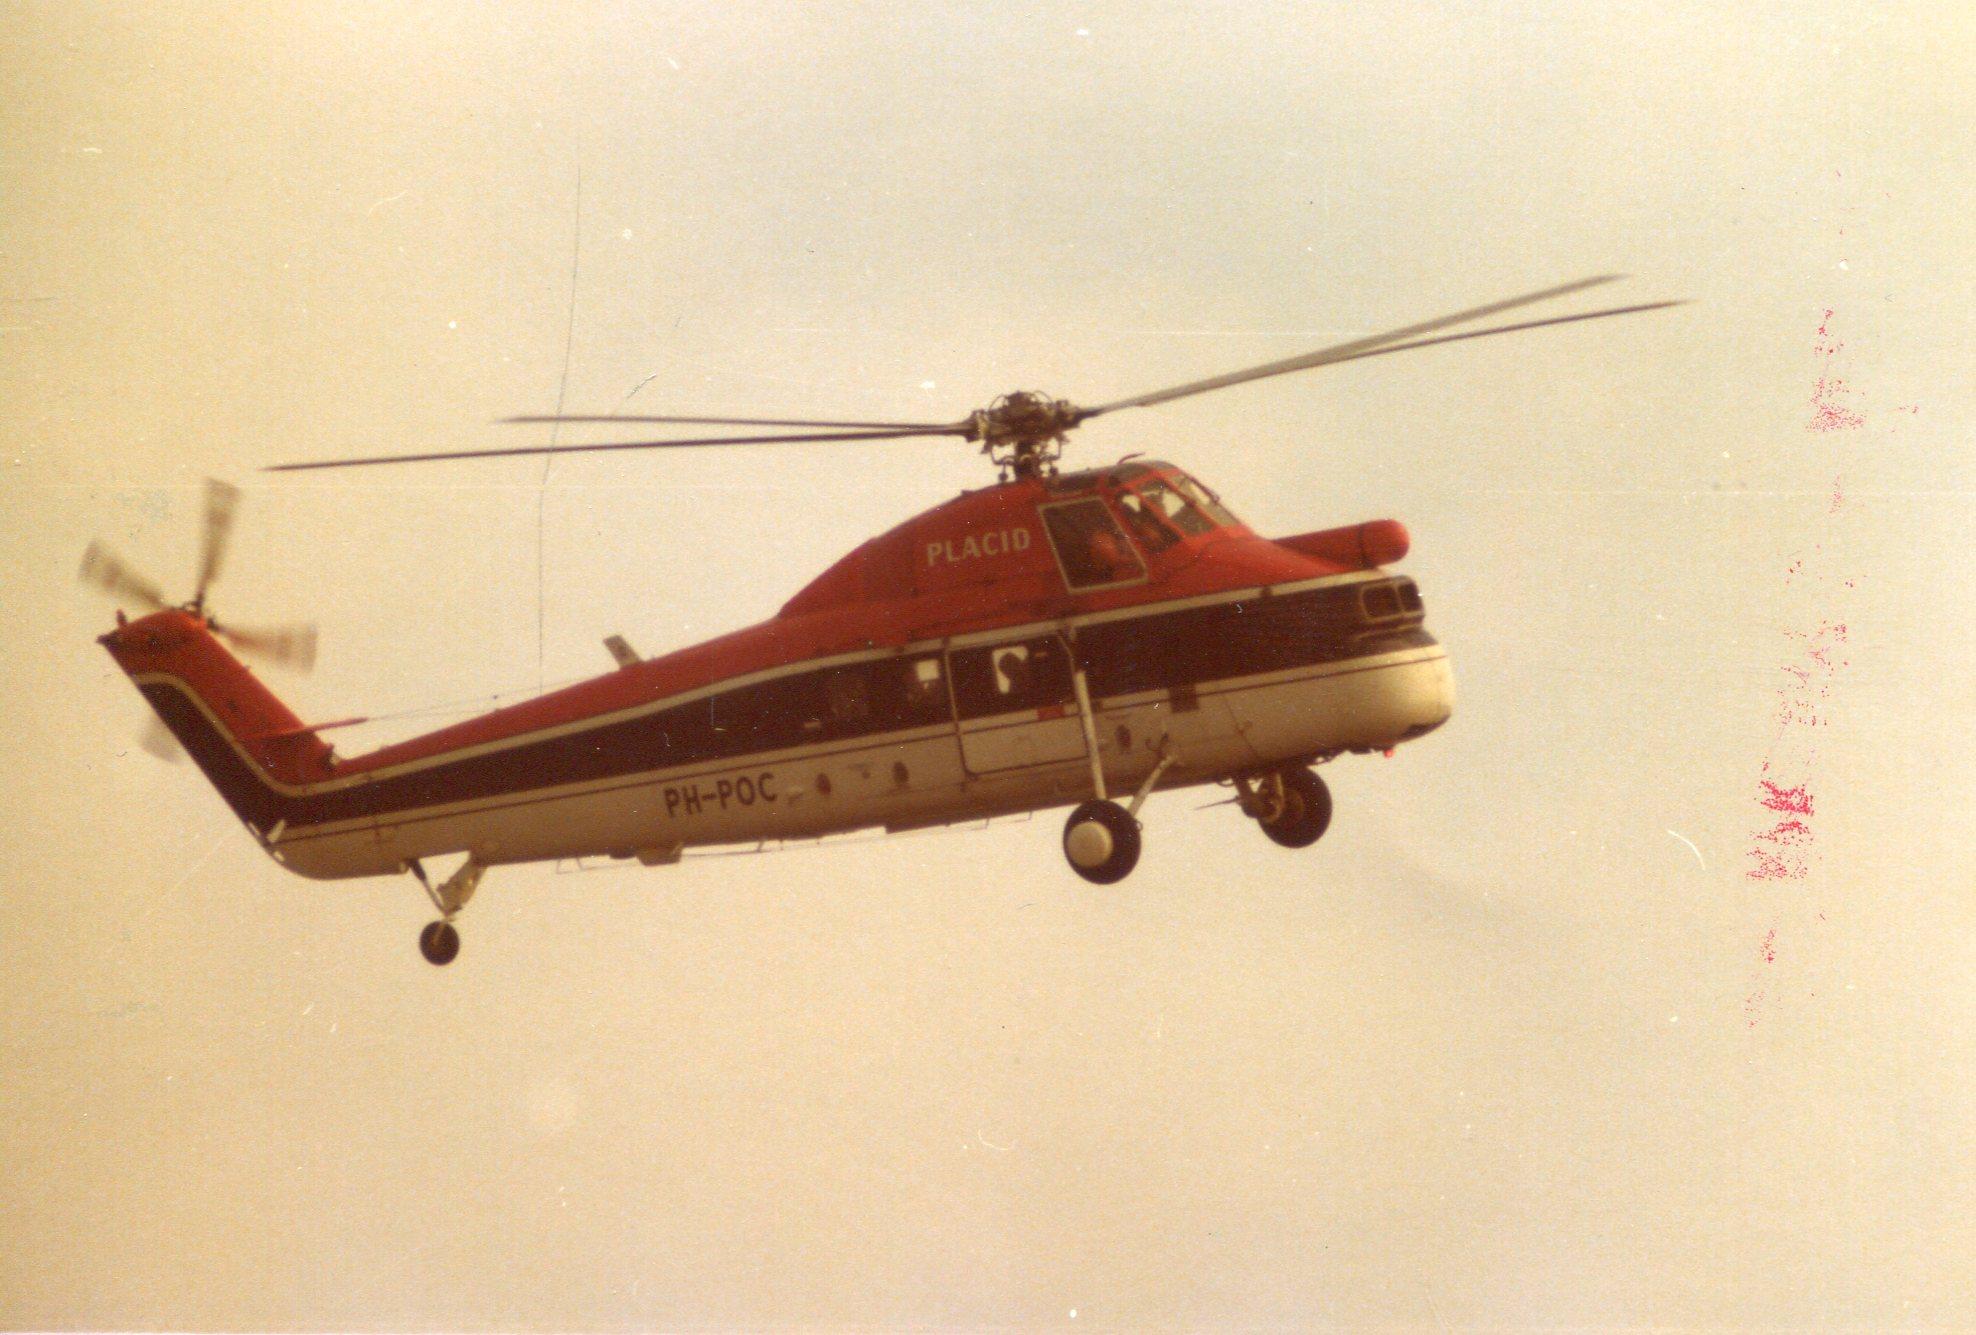 Naam: Den Helder , april 1977 (3).jpg Bekeken: 404 Grootte: 334,4 KB